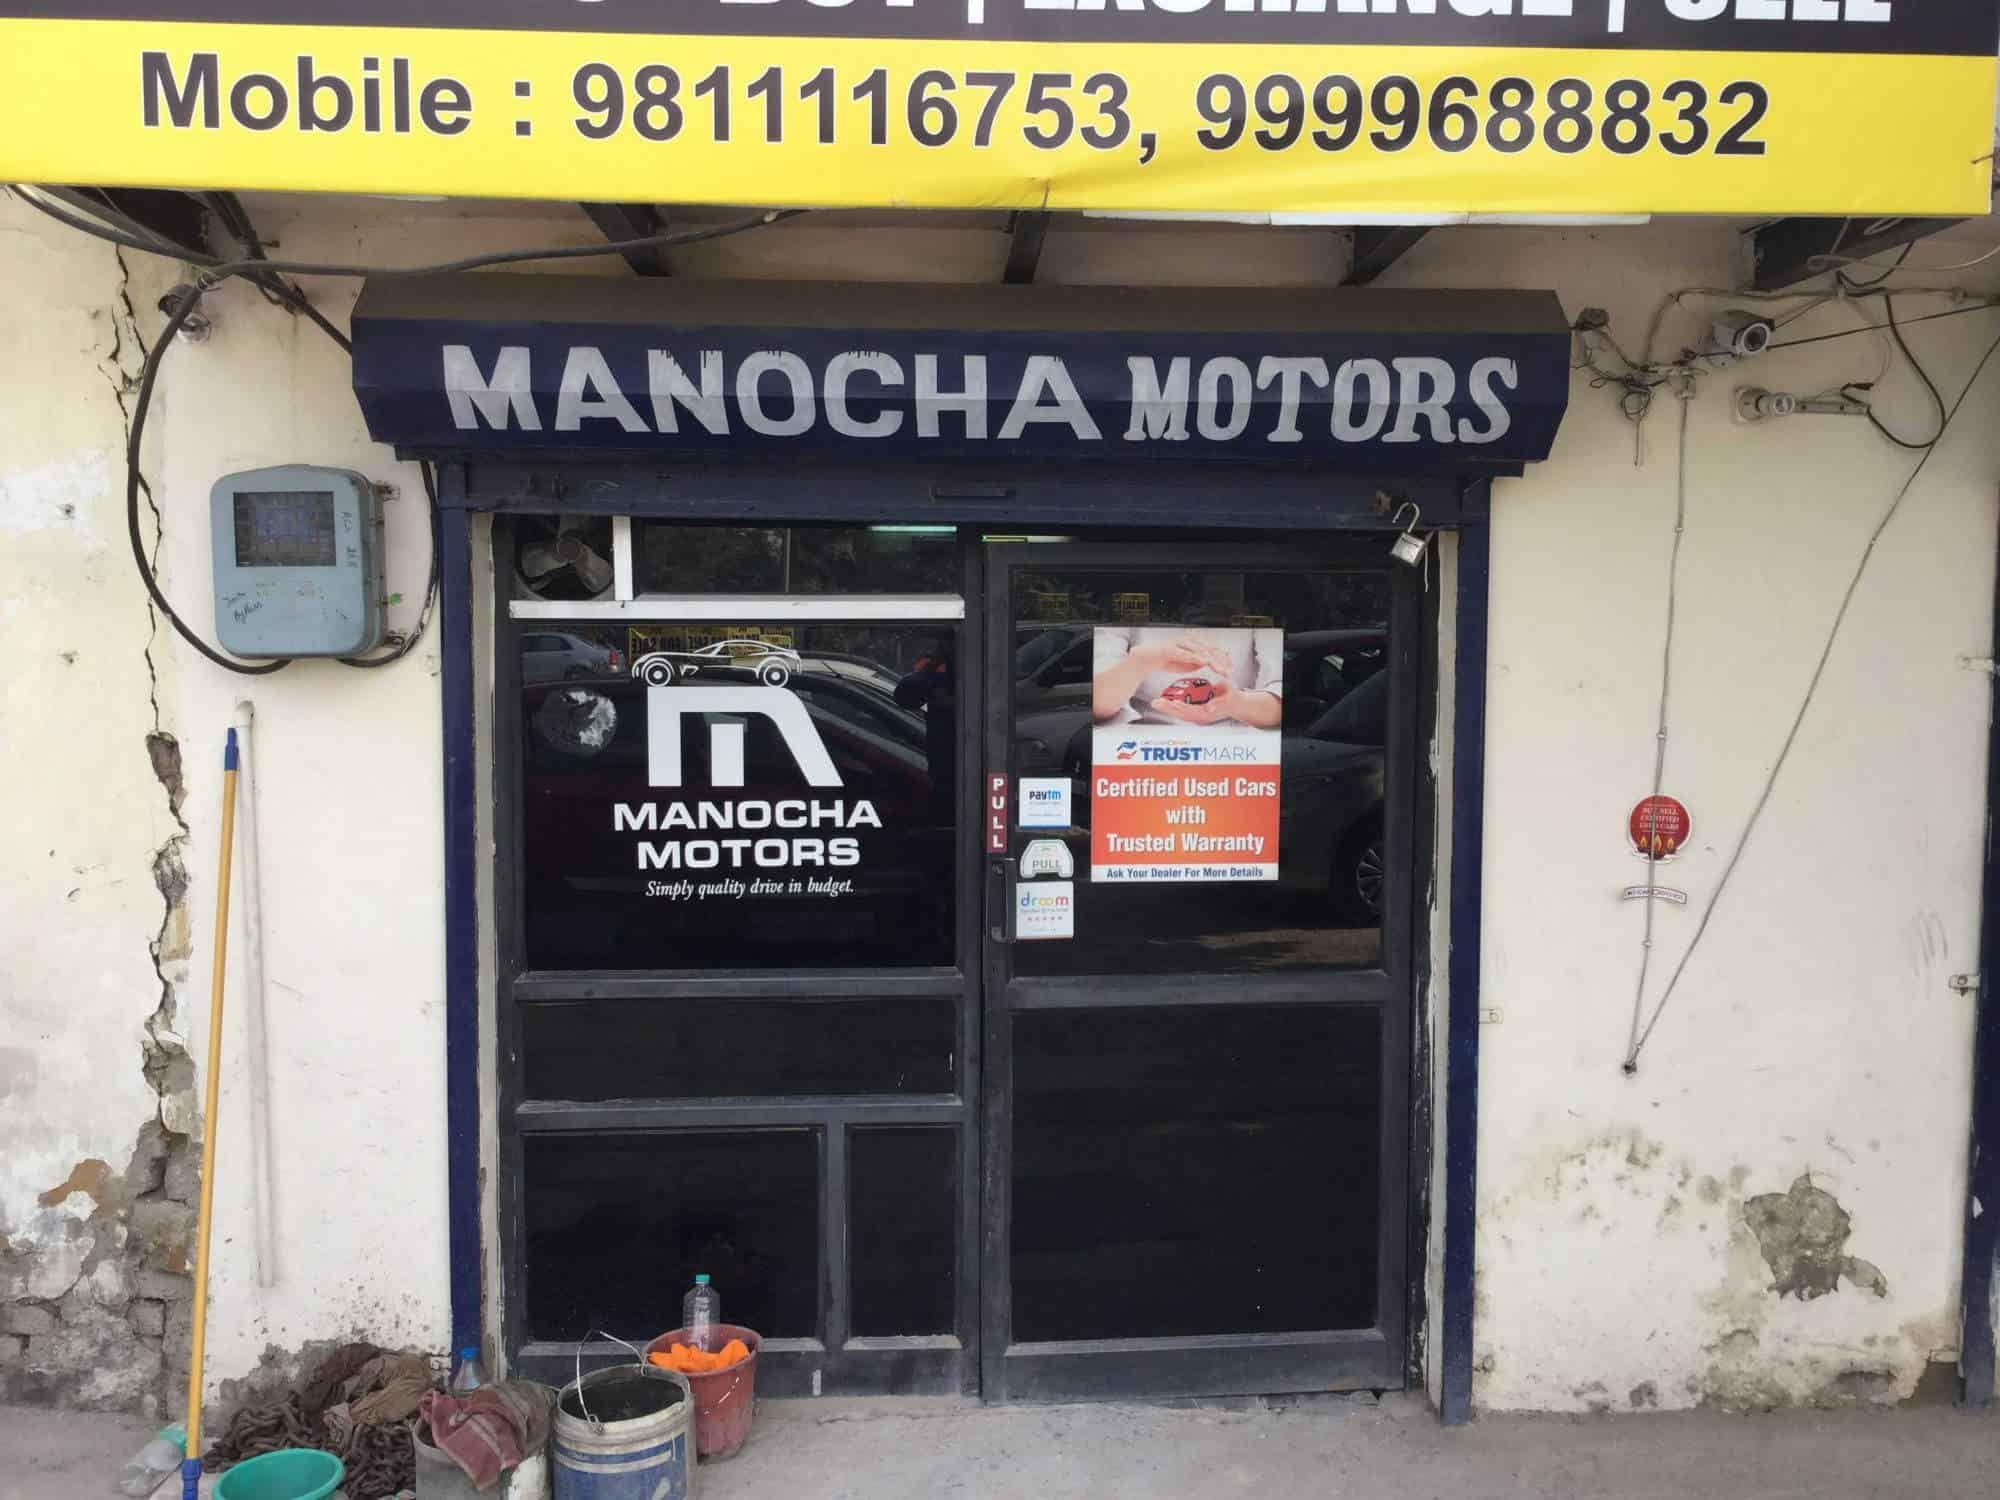 Manocha Motors